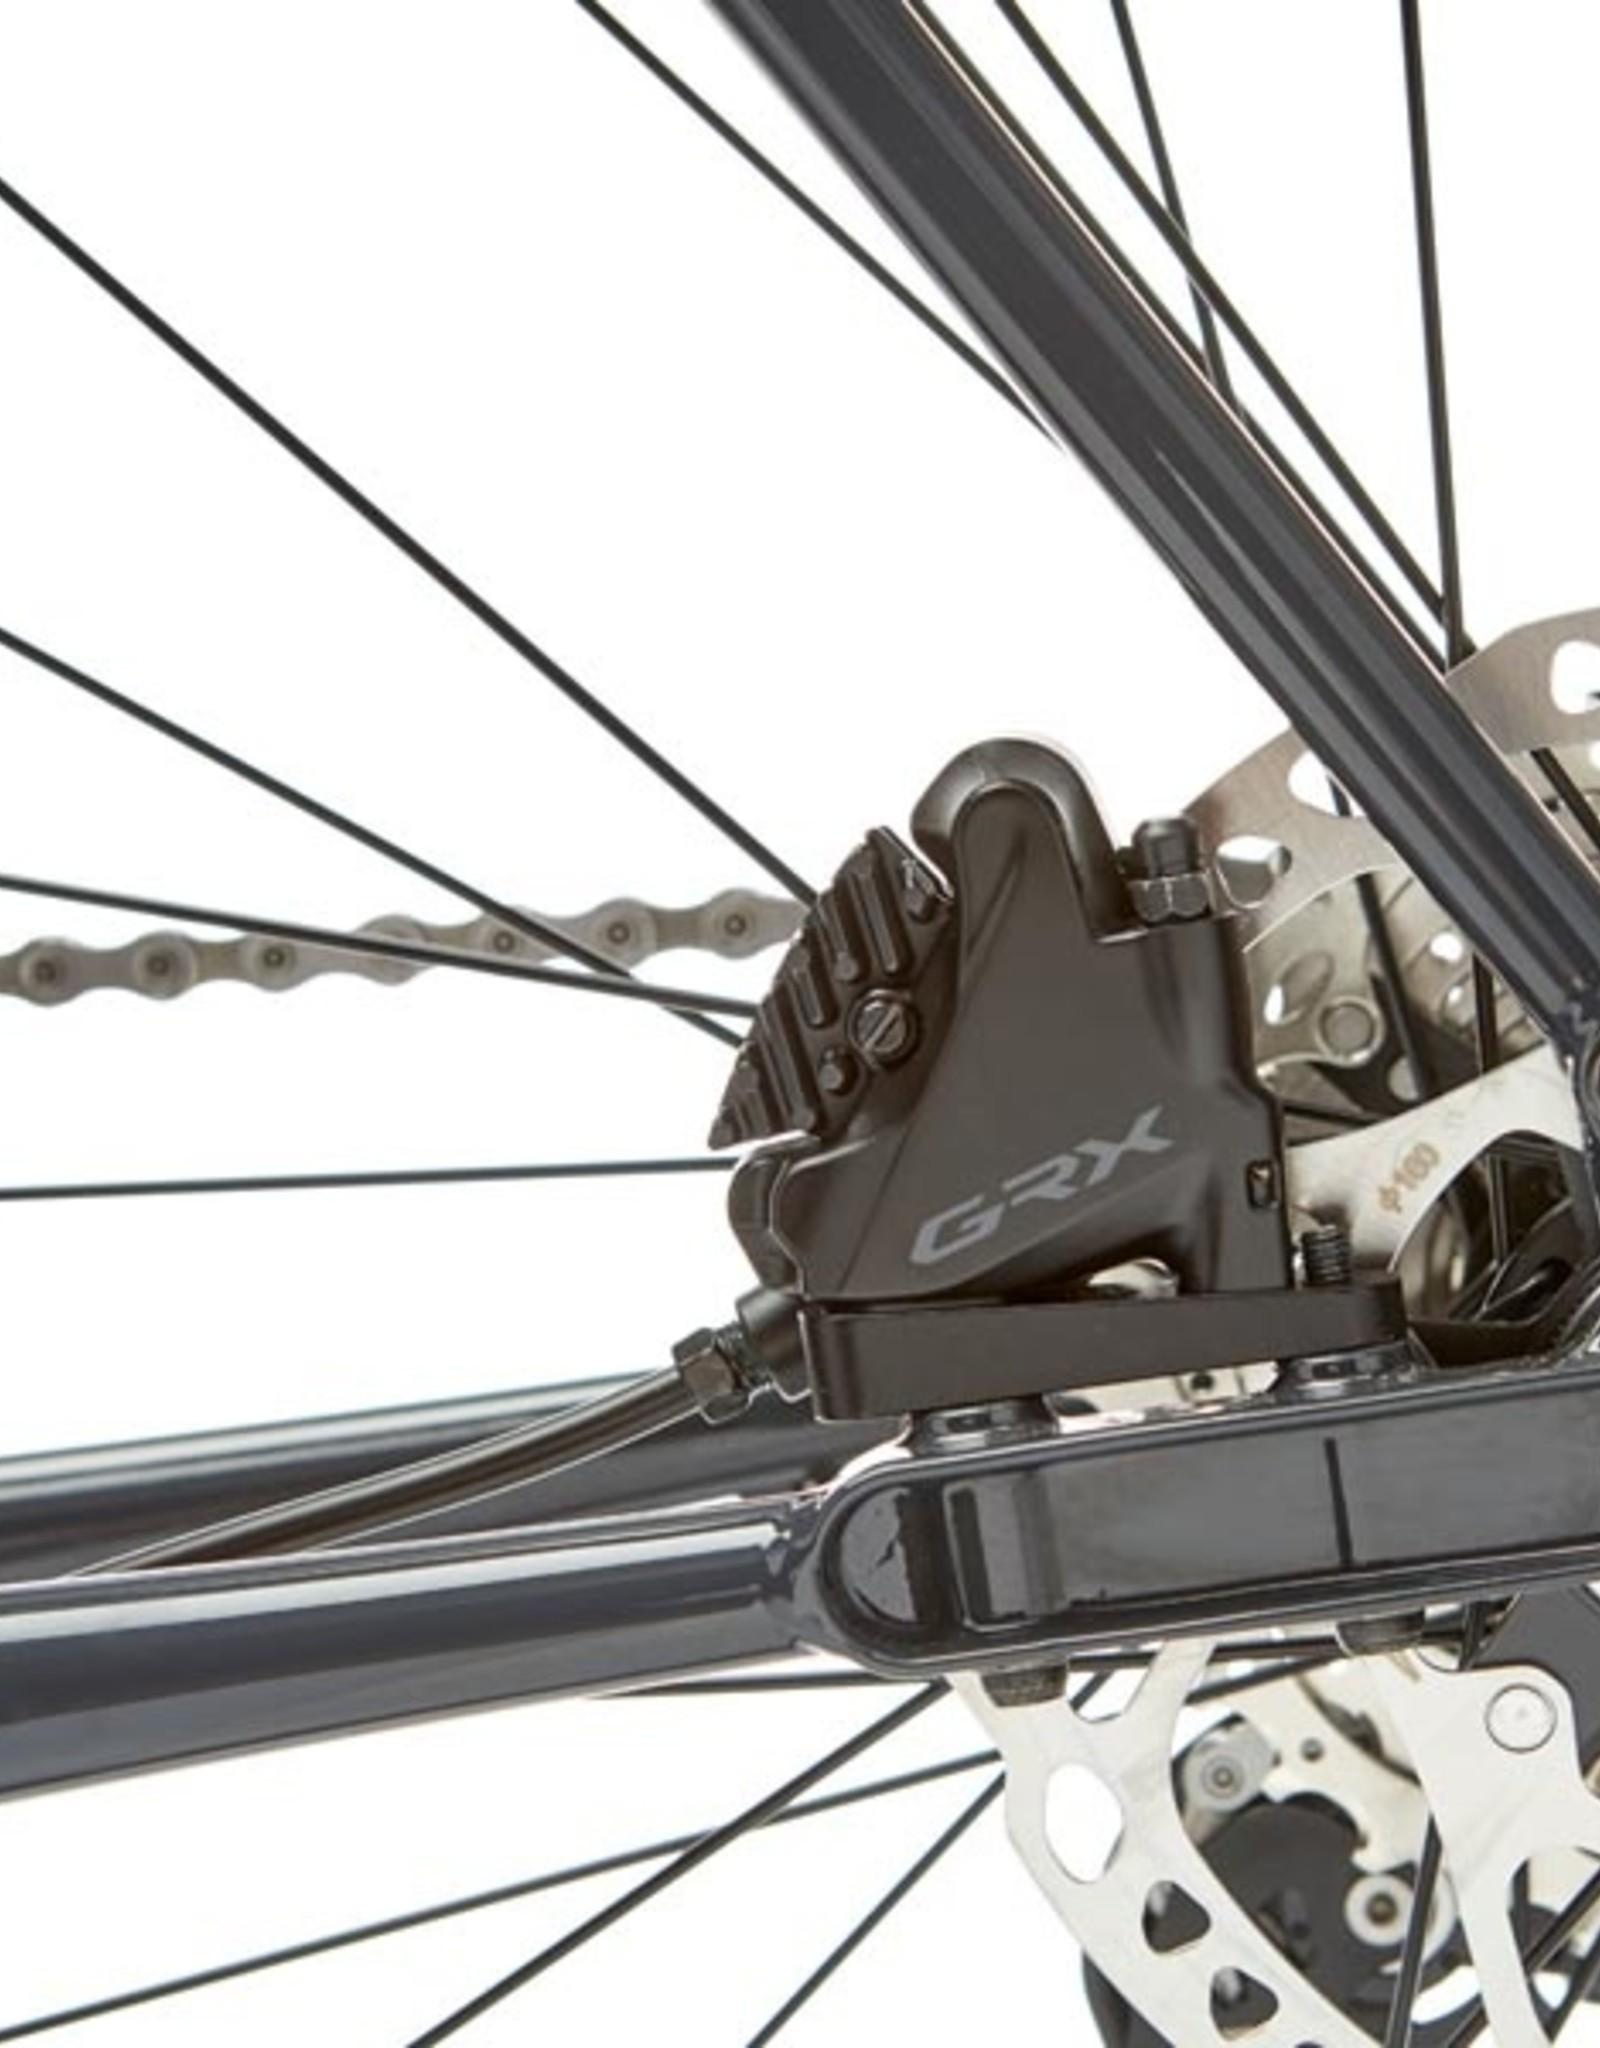 Kona Bicycles Kona Rove Swift (Gloss Earth Grey) 2020 Gravel/Touring Bicycle